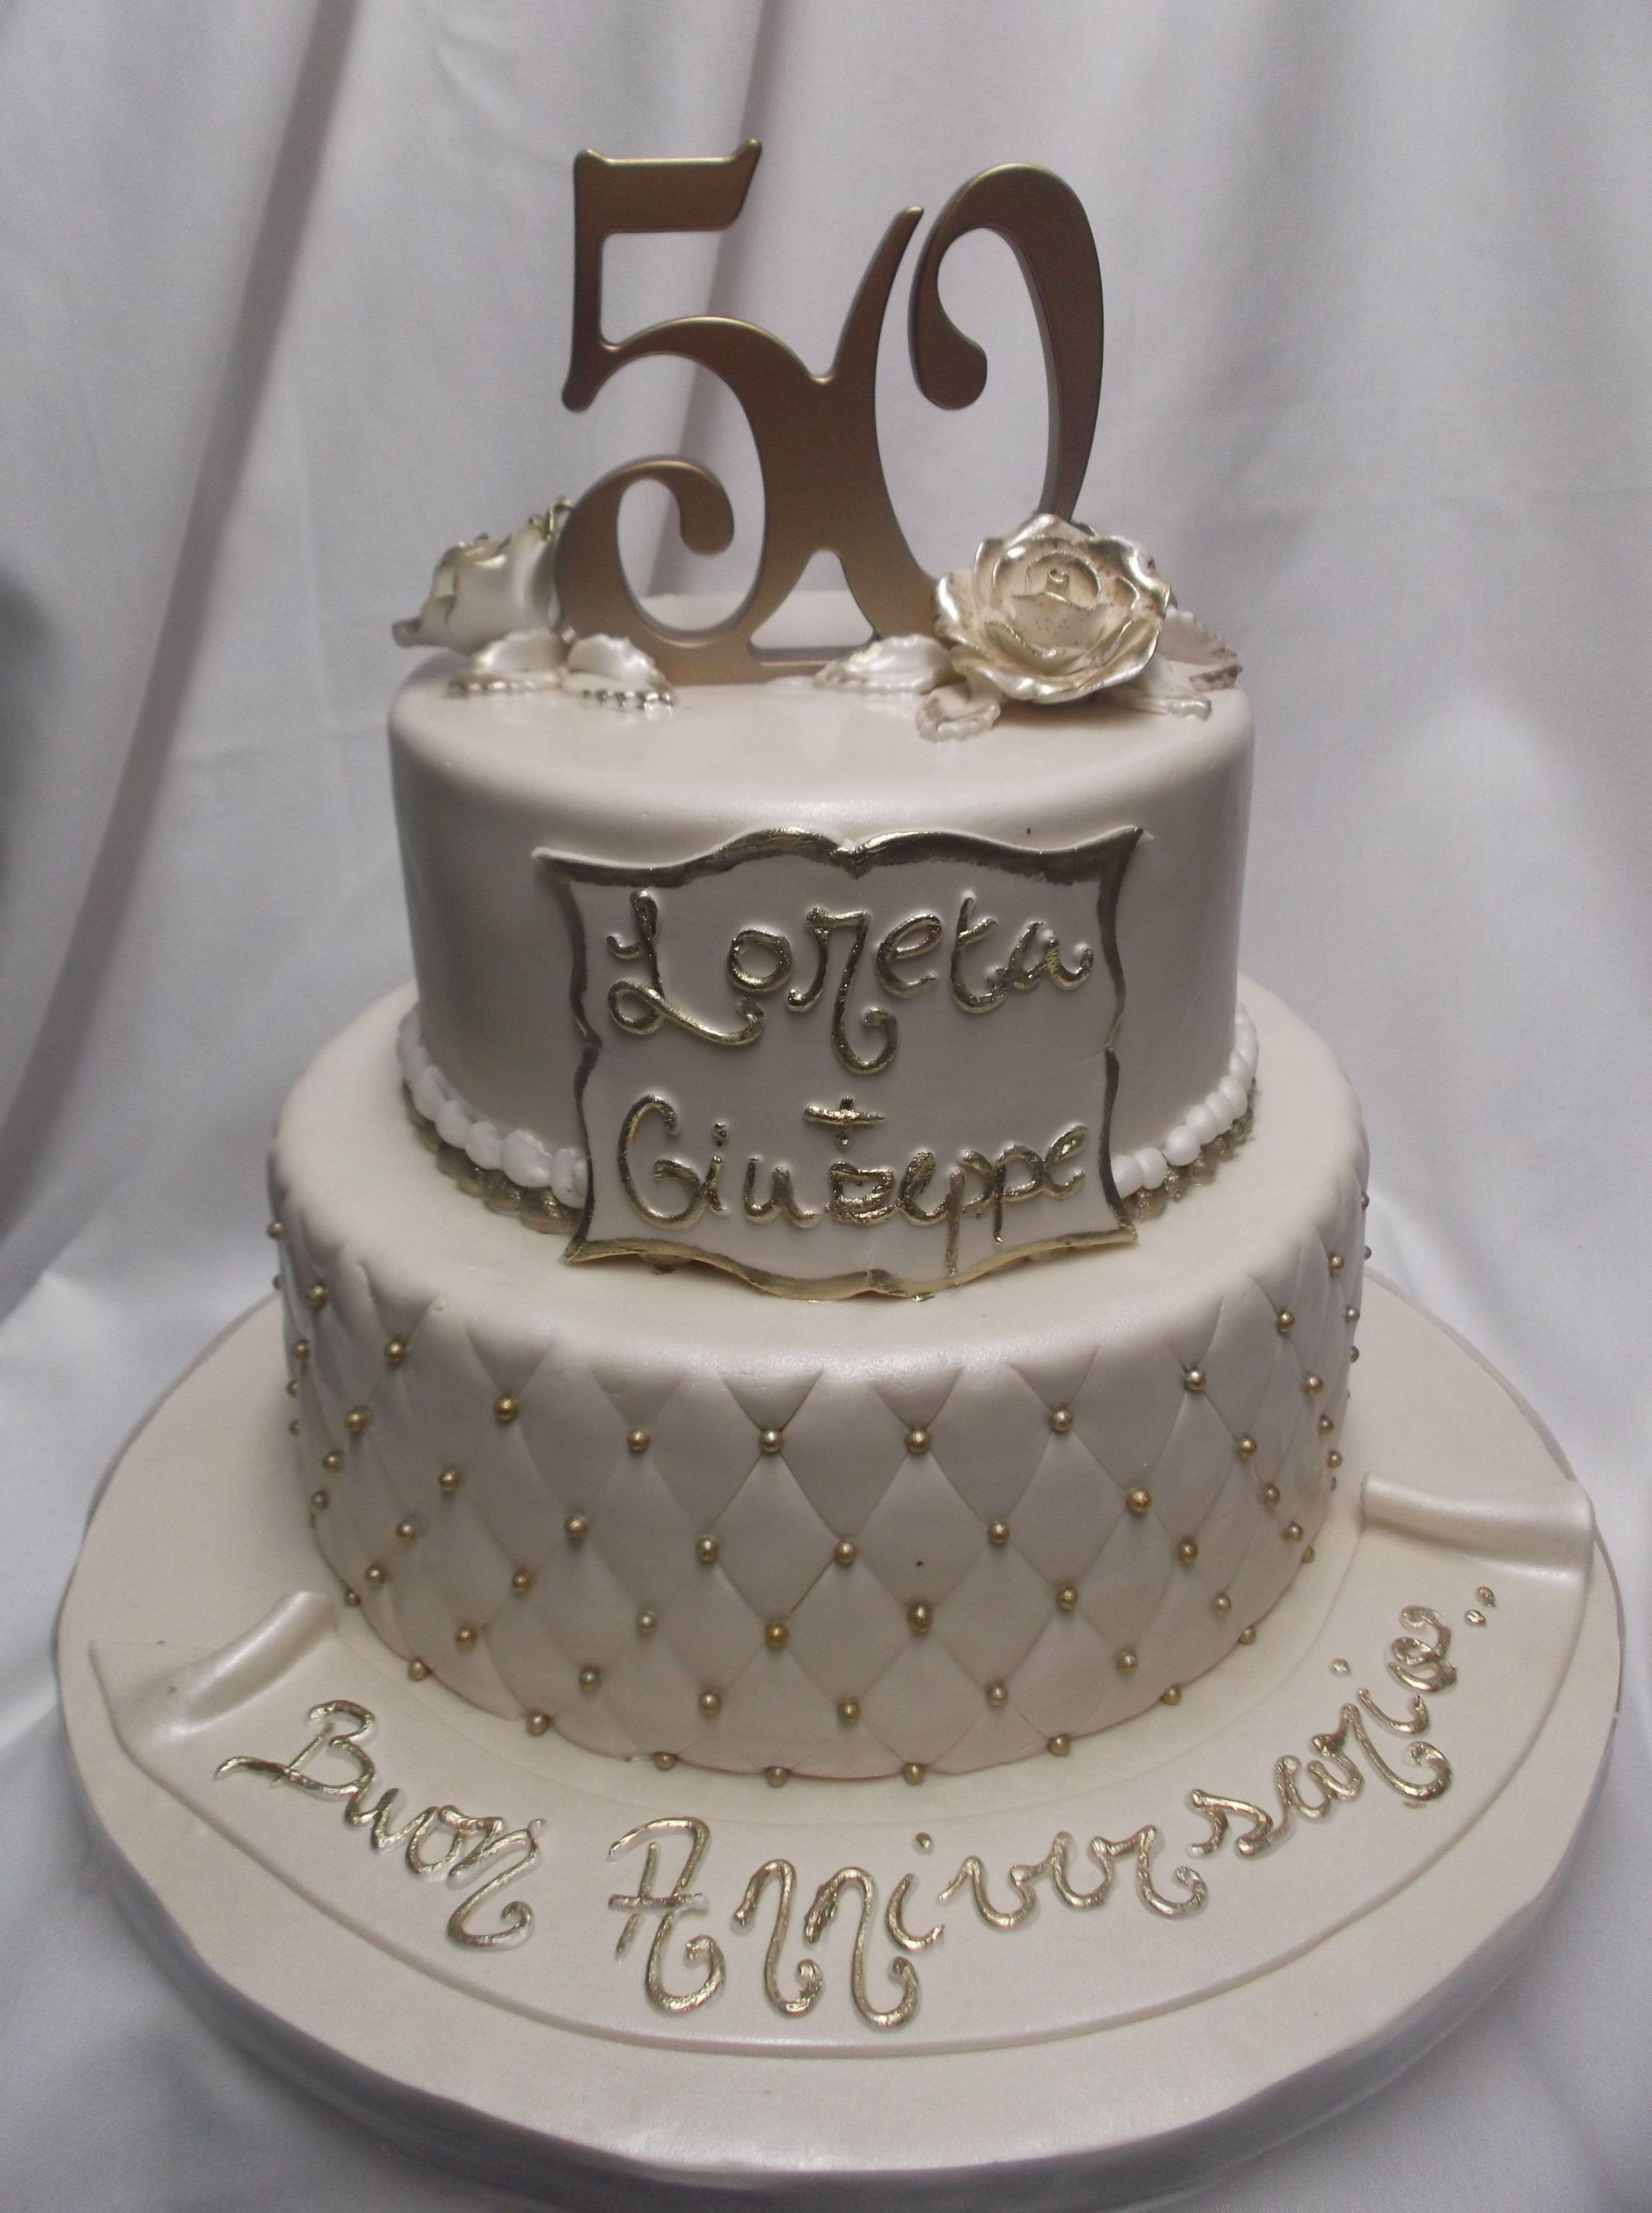 50th wedding anniversary pinterest 50th wedding anniversary ideas More Funny 50th Birthday Cakes For Women